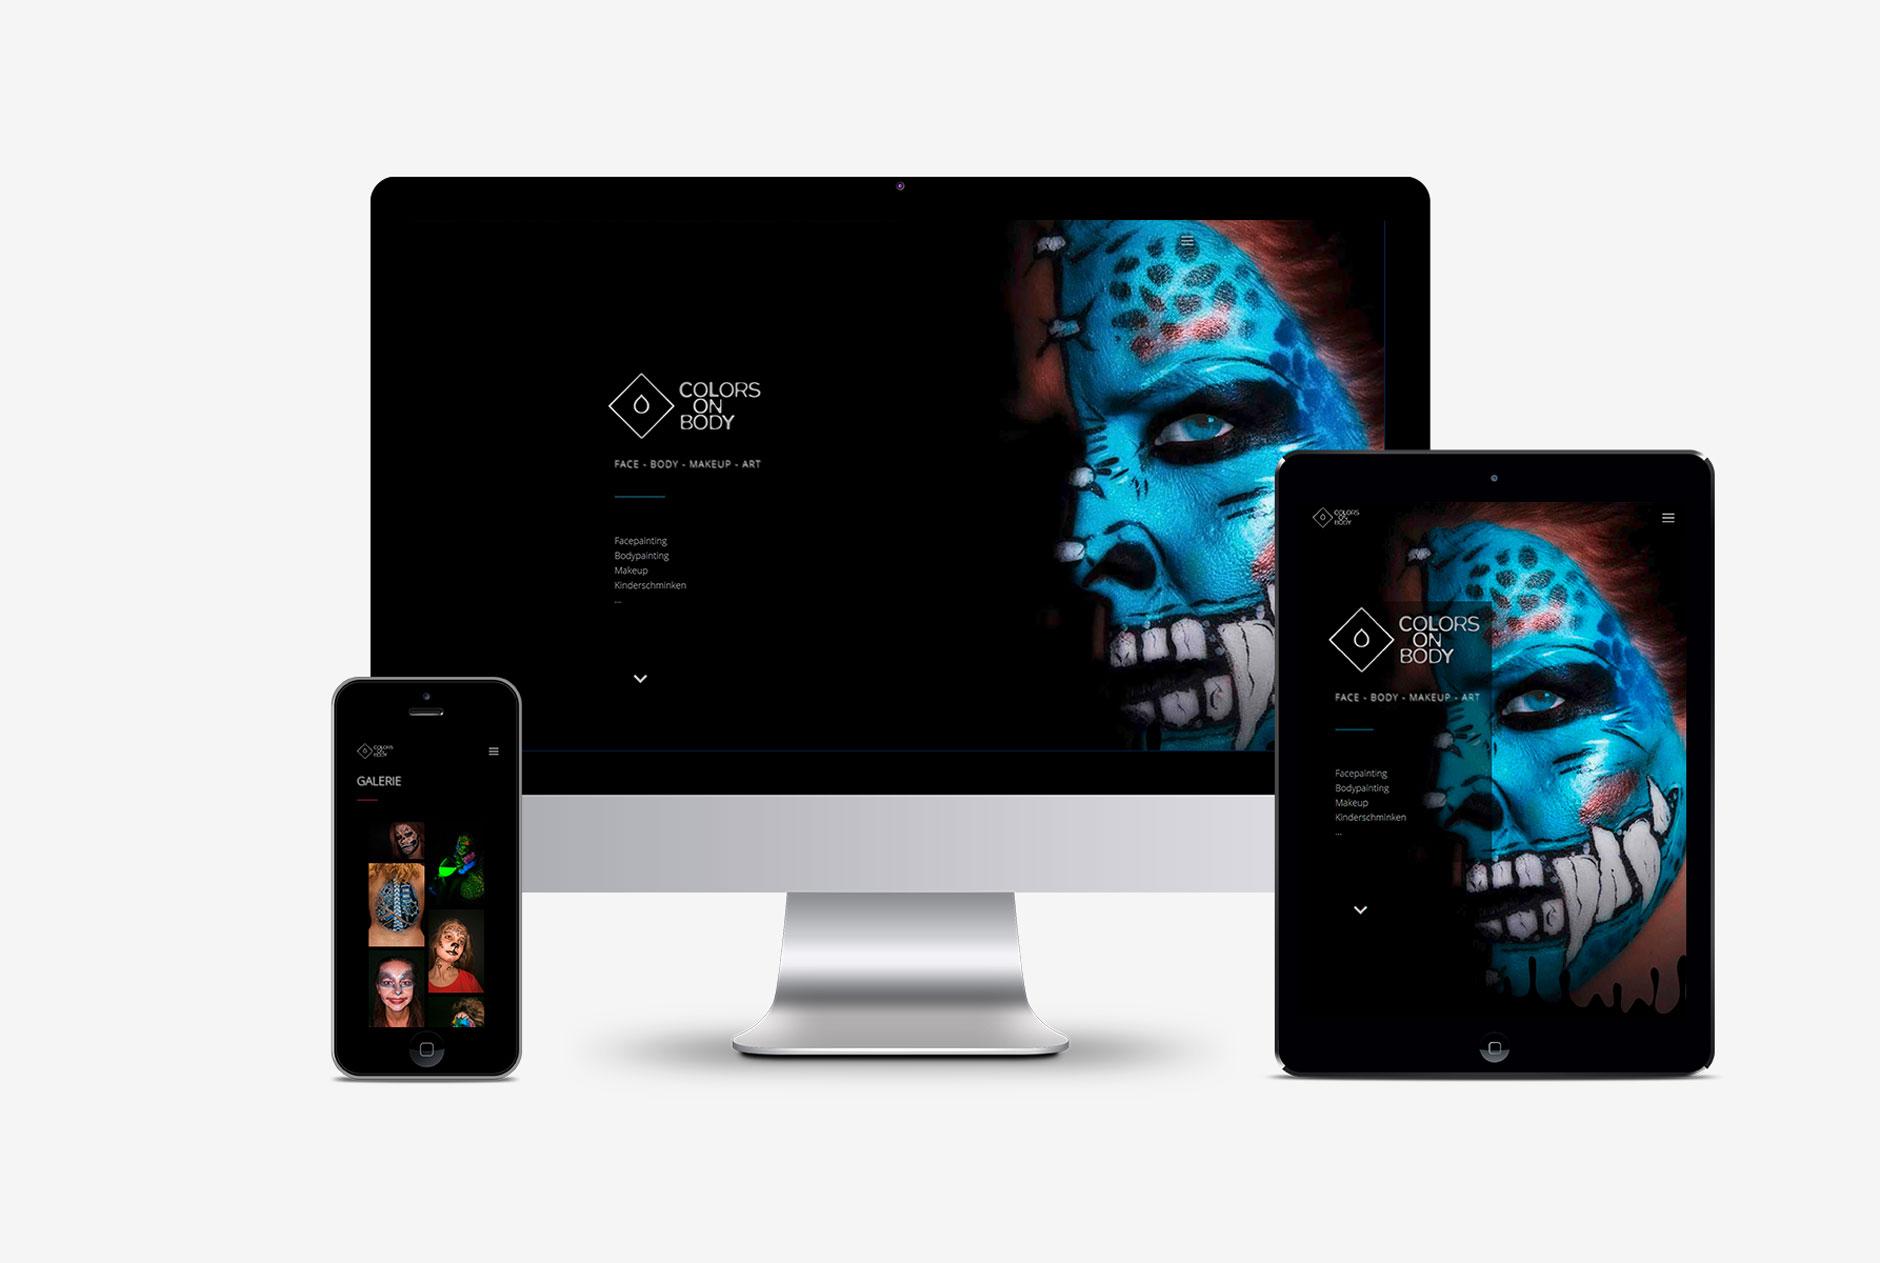 colors on body webdesign wordpress-Website Design Colors on Body